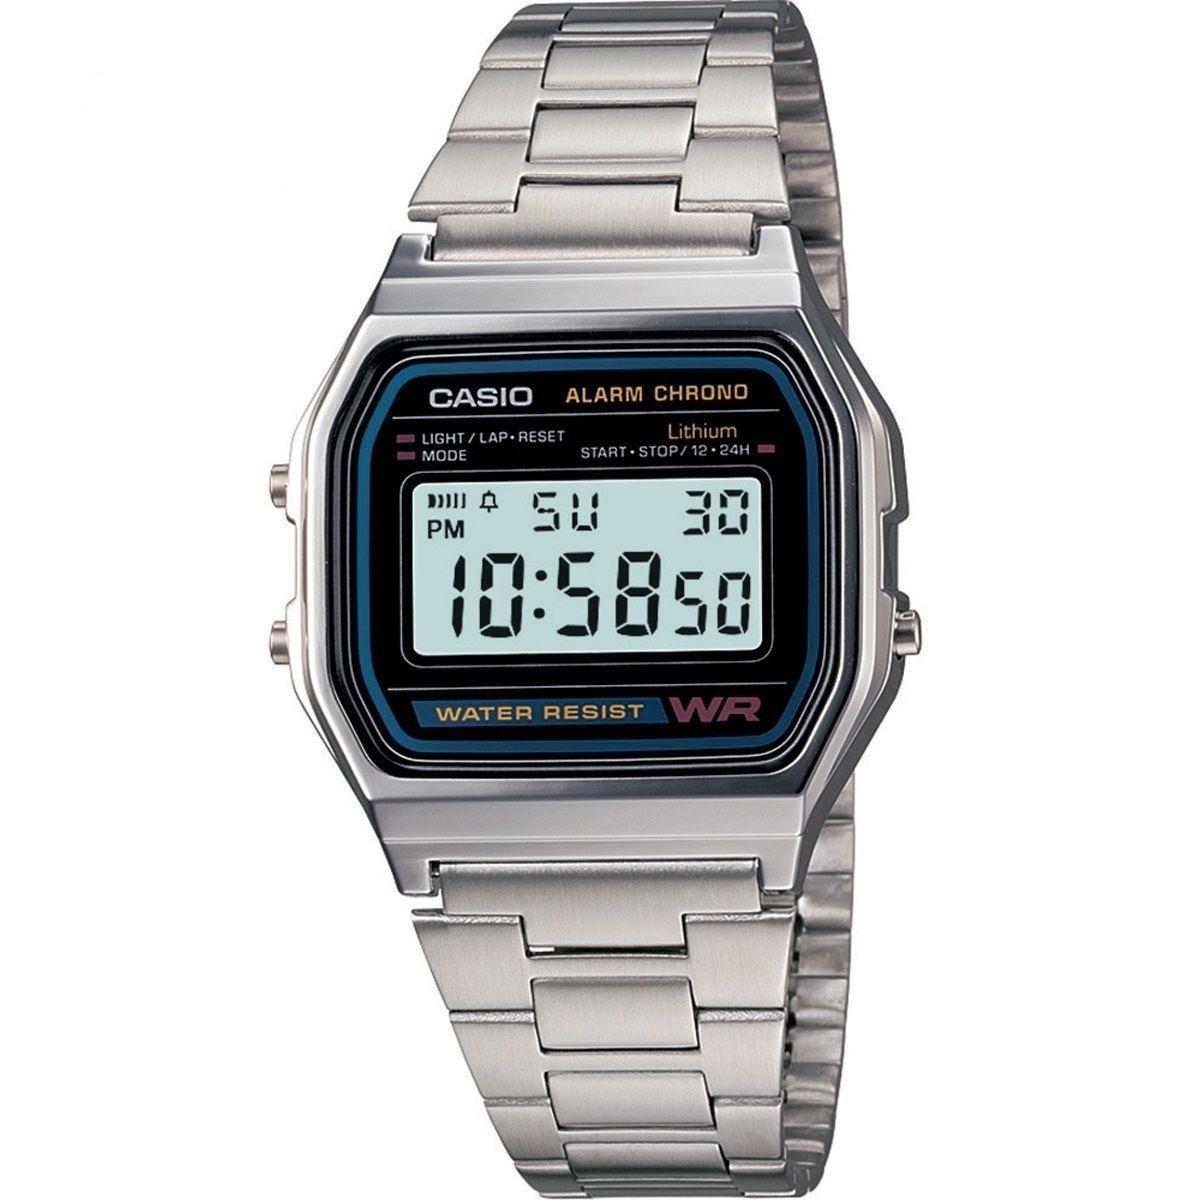 [ebay] Casio Collection Armbanduhr A158WA-1DF Silber 18,99 inkl. Versand